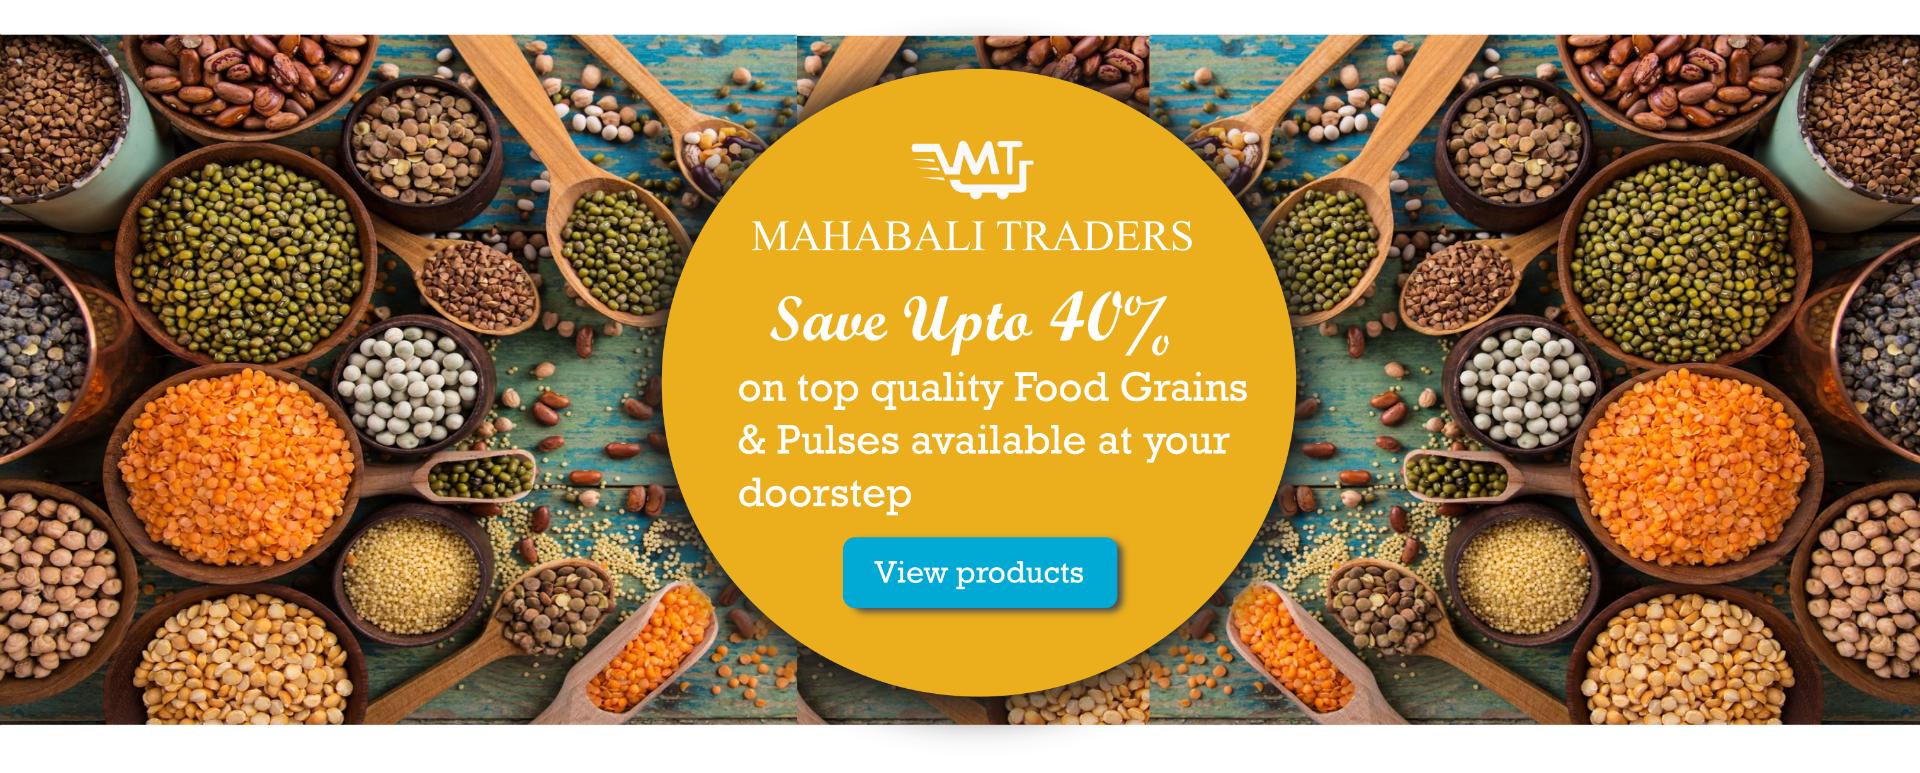 Mahabali Traders - Grocery Store in Govindpura, Bhopal